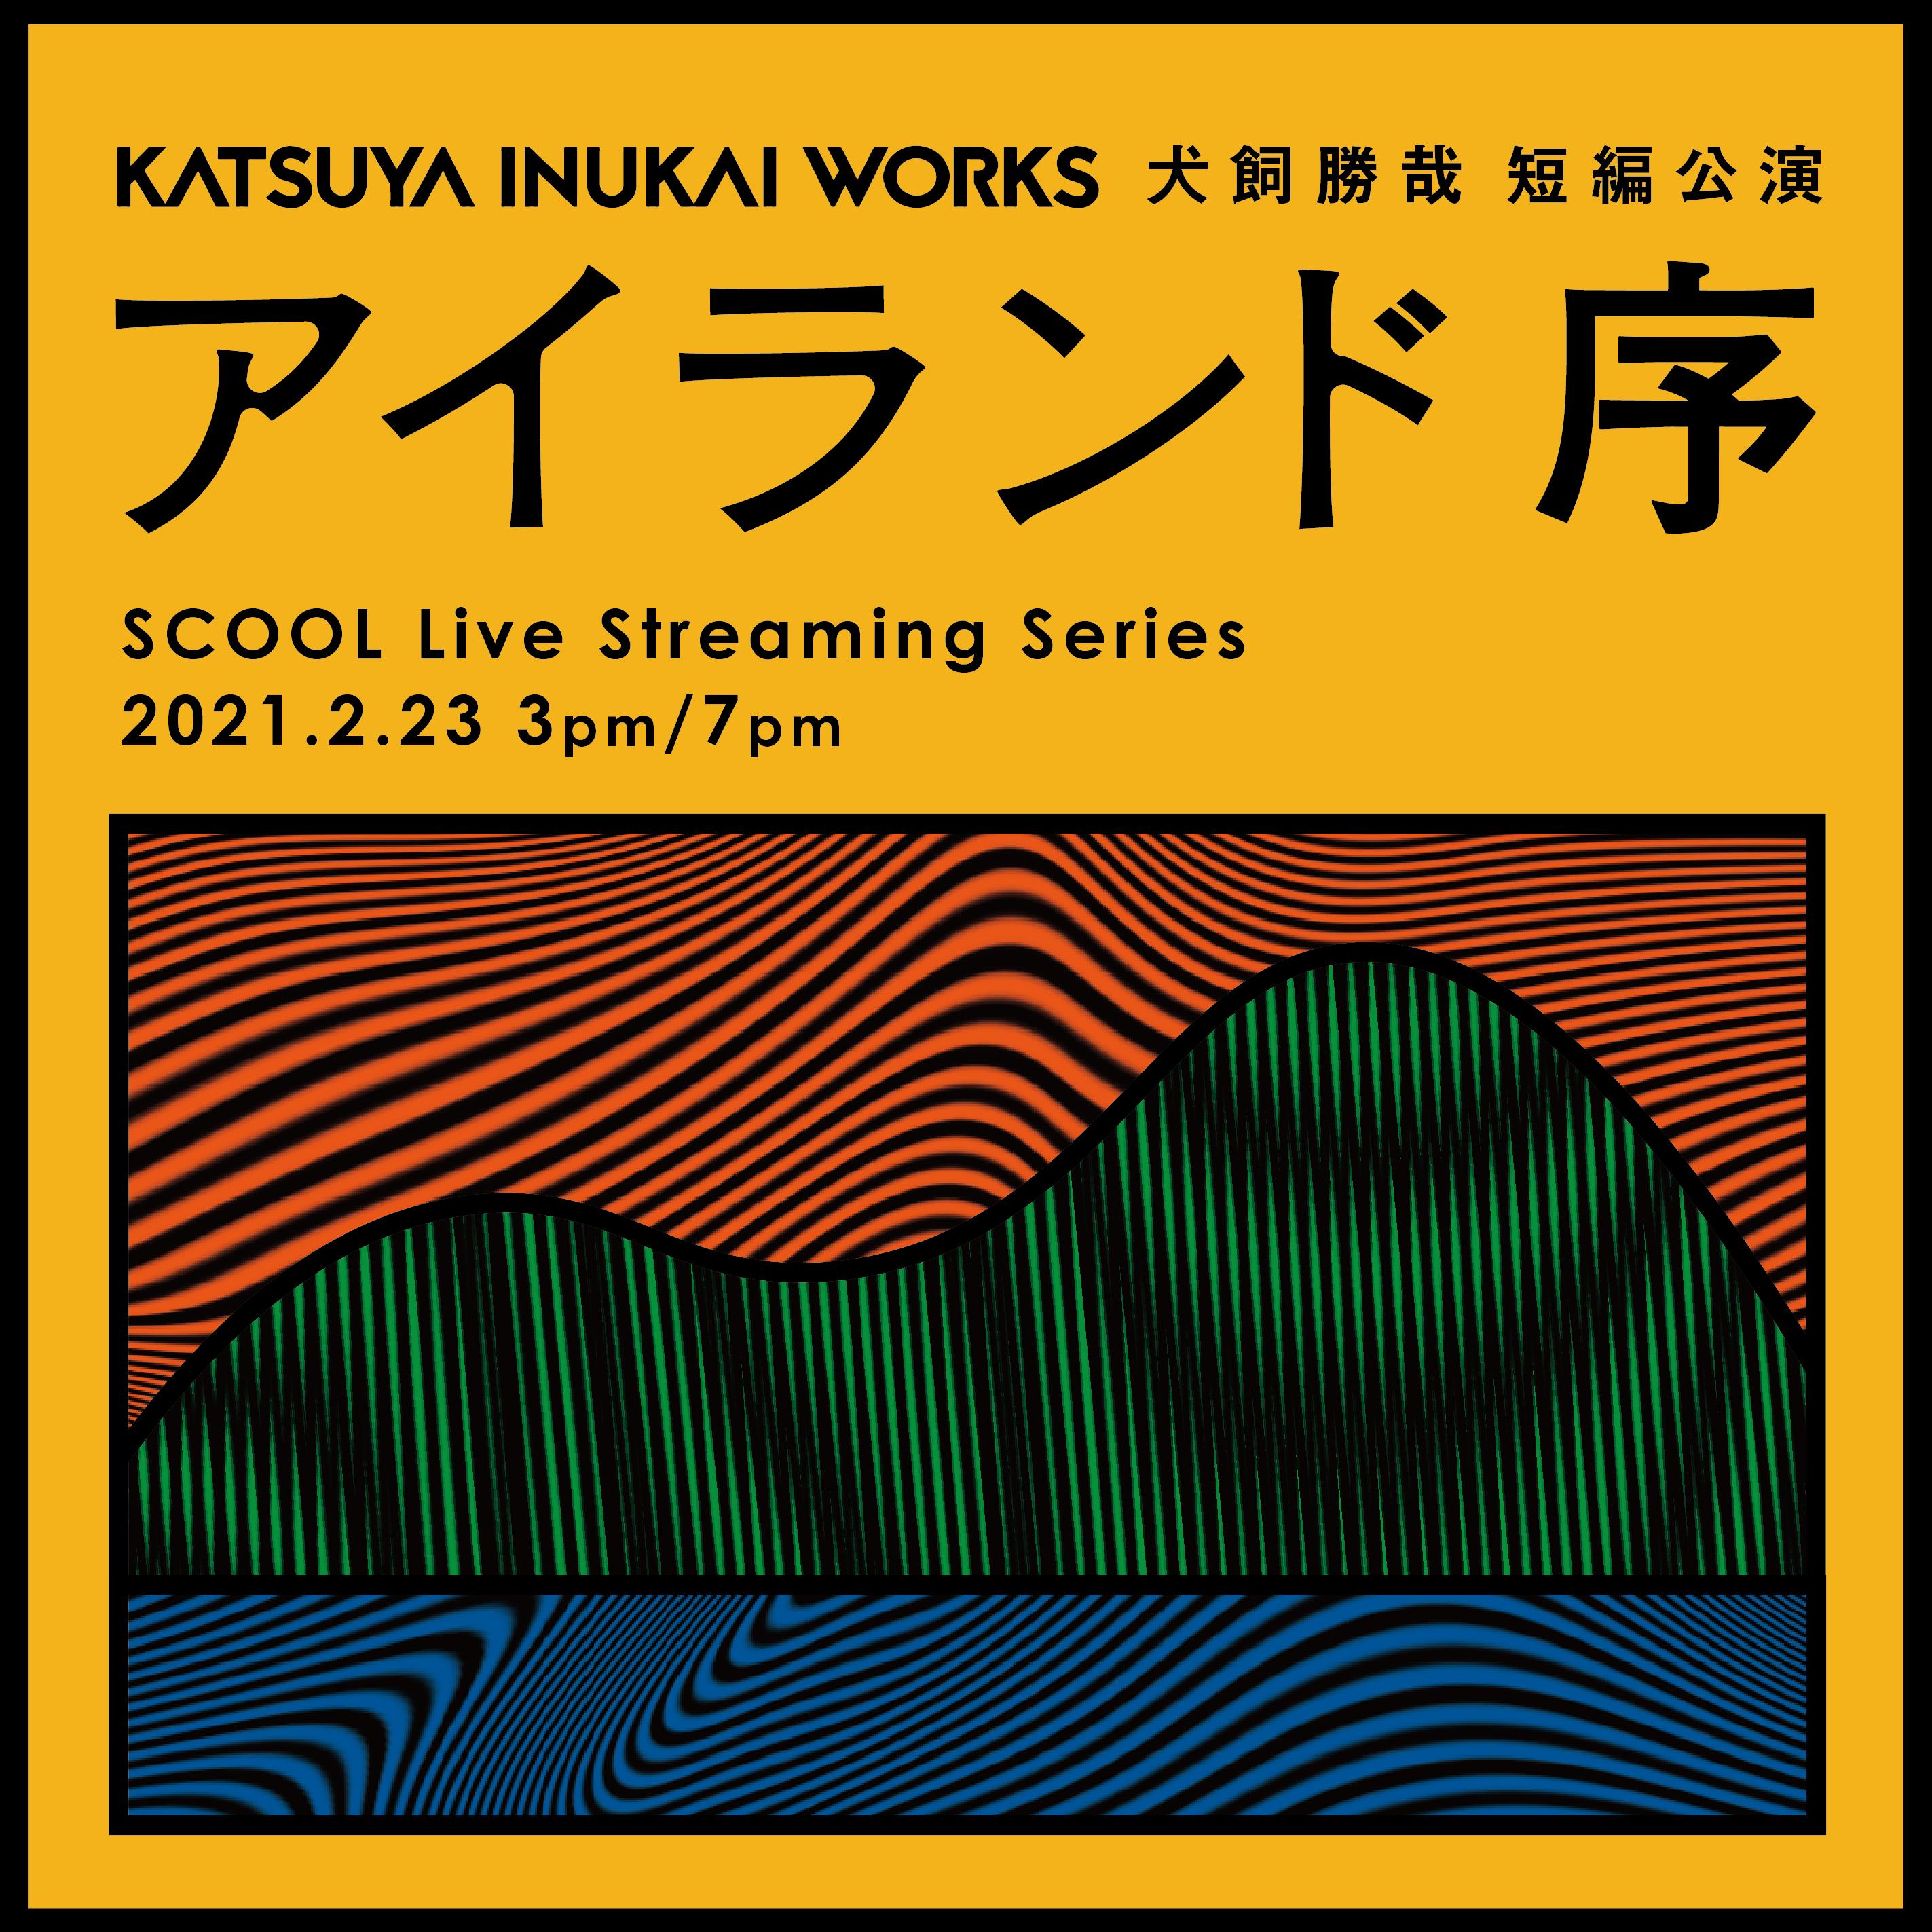 SCOOL Live Streaming Series <br>犬飼勝哉 短編演劇『アイランド 序』